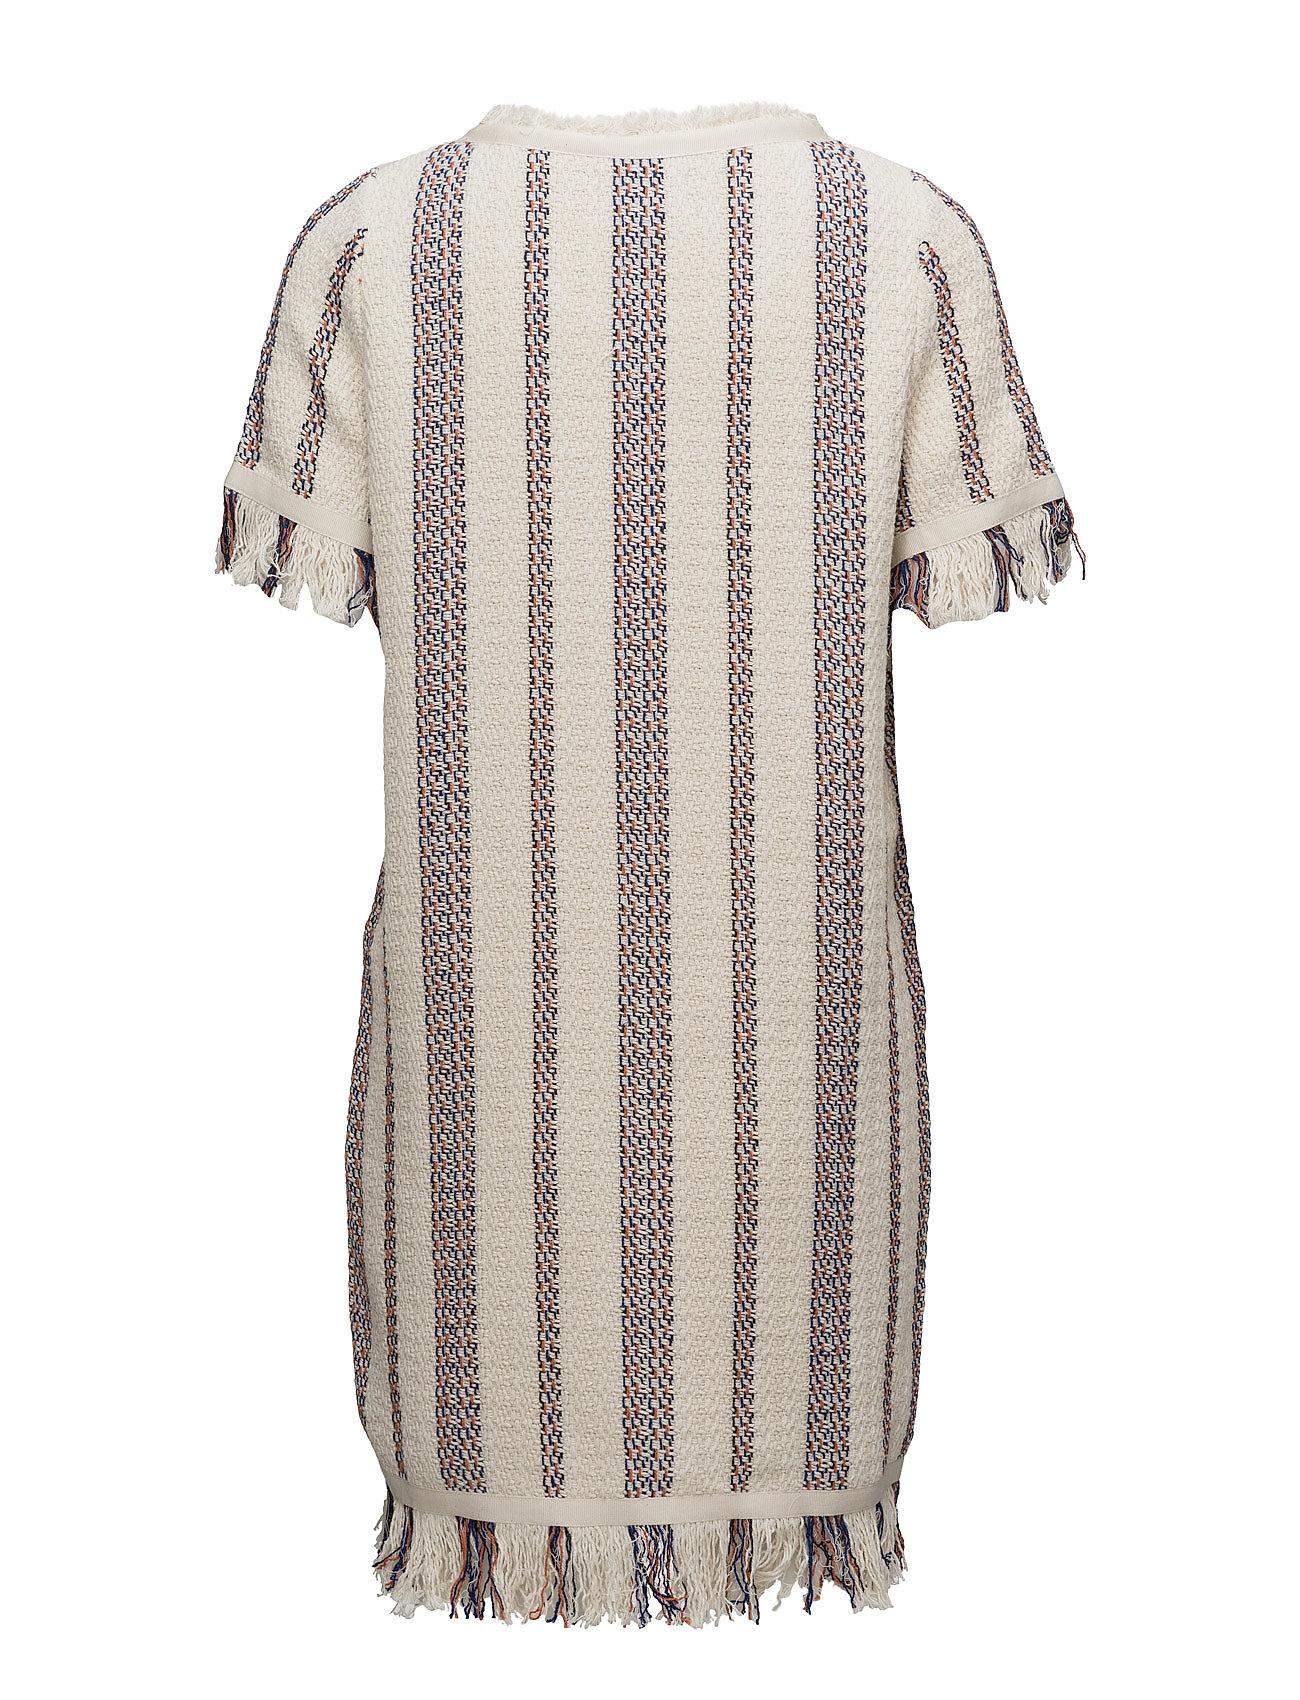 Baha Fringe Clothing Dressmulti StripeLexington Woven wknOP0